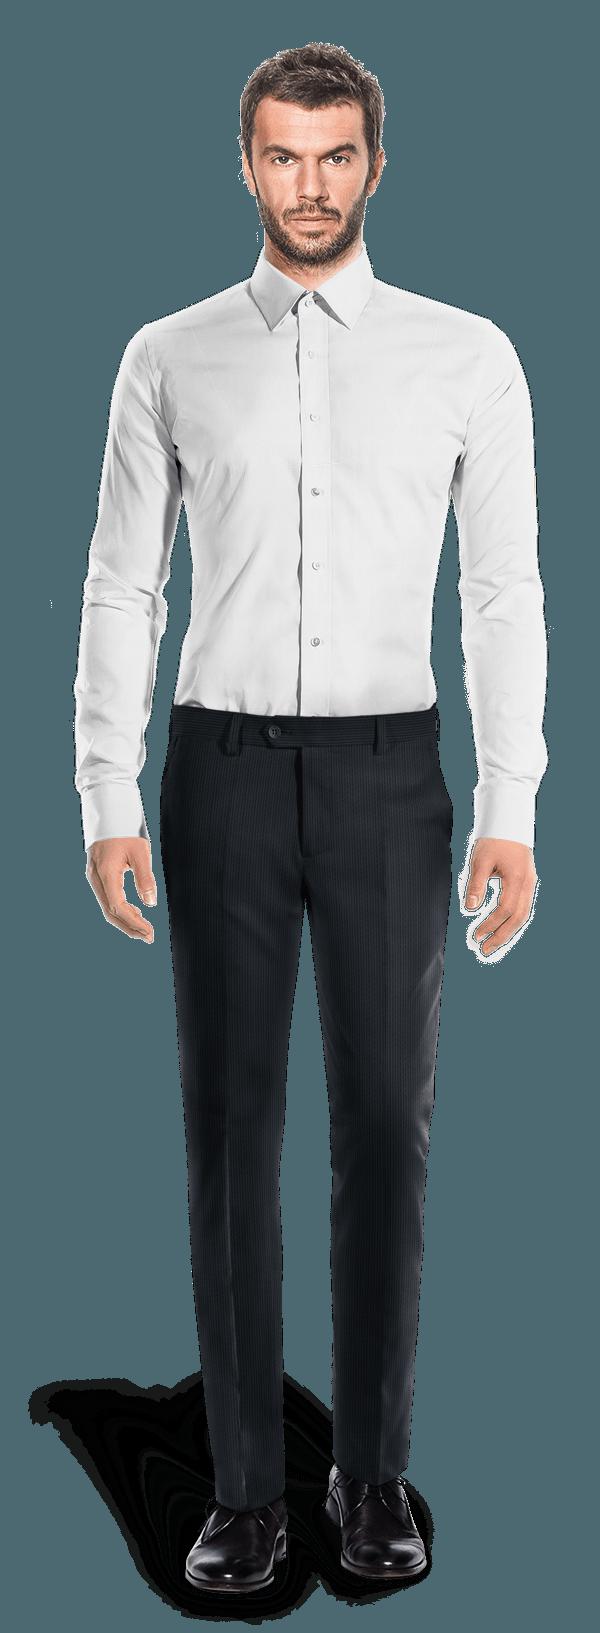 Blaue tailliert Hose aus Cord